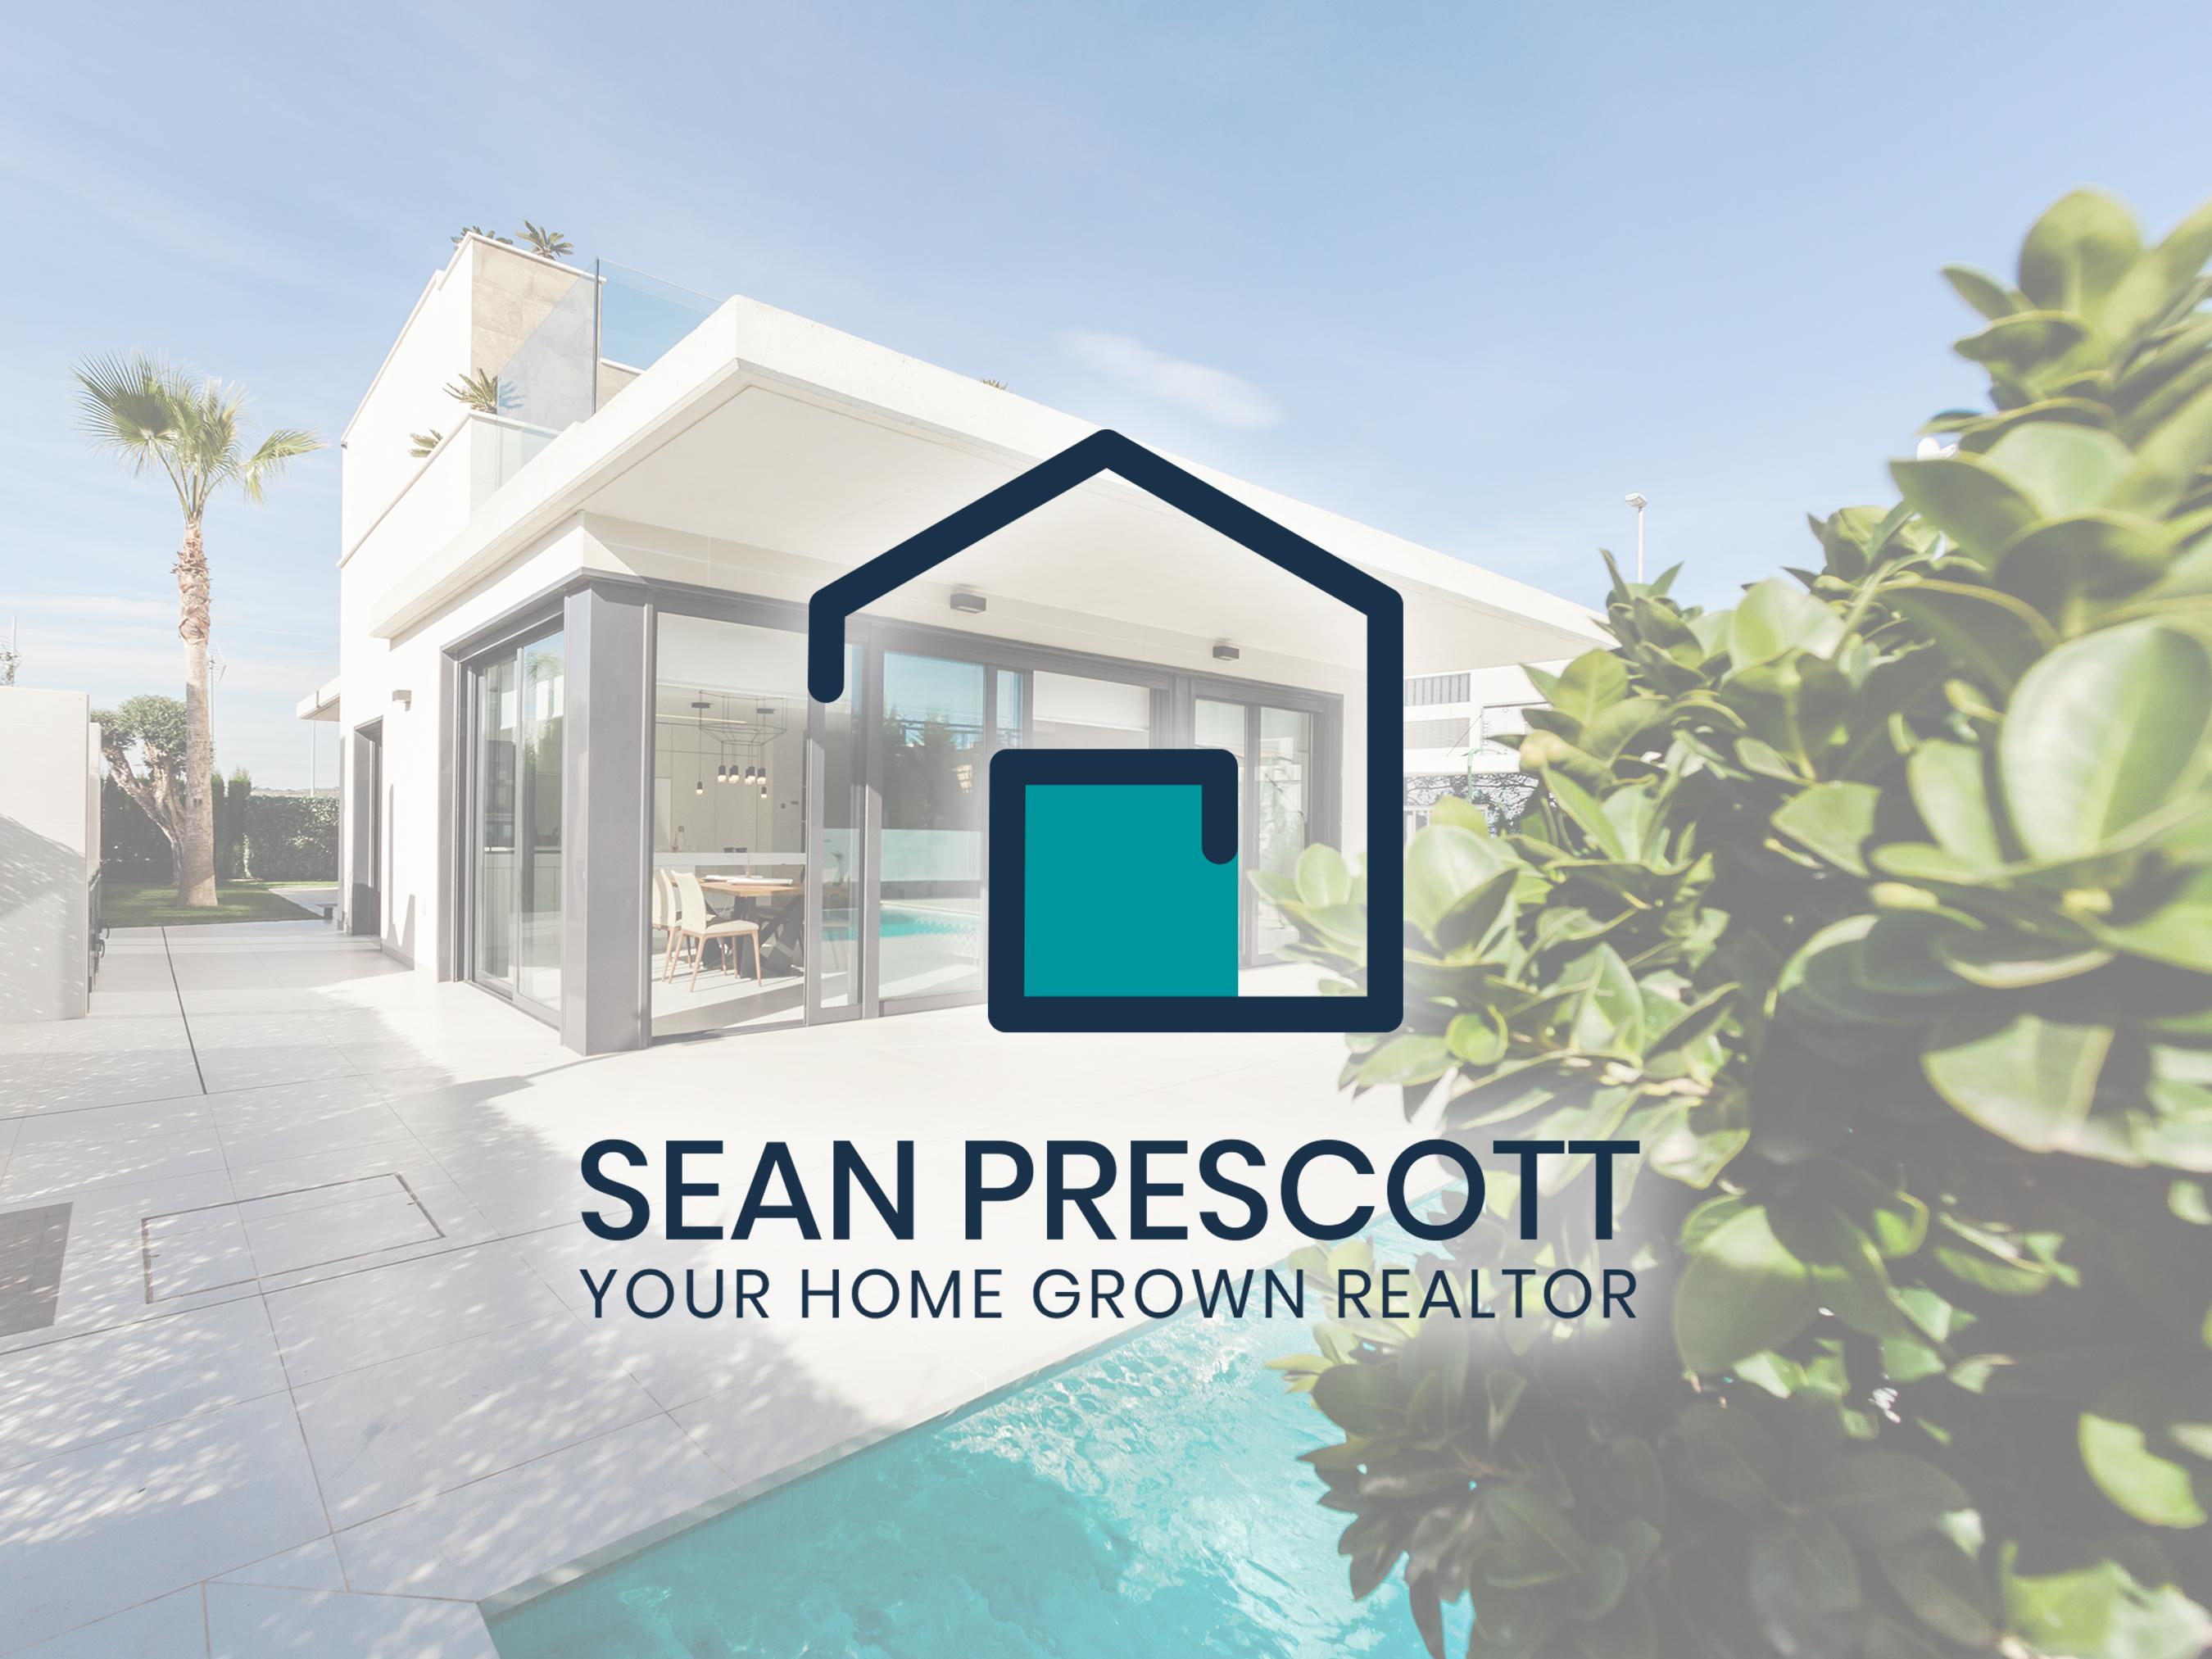 Sean B. Prescott